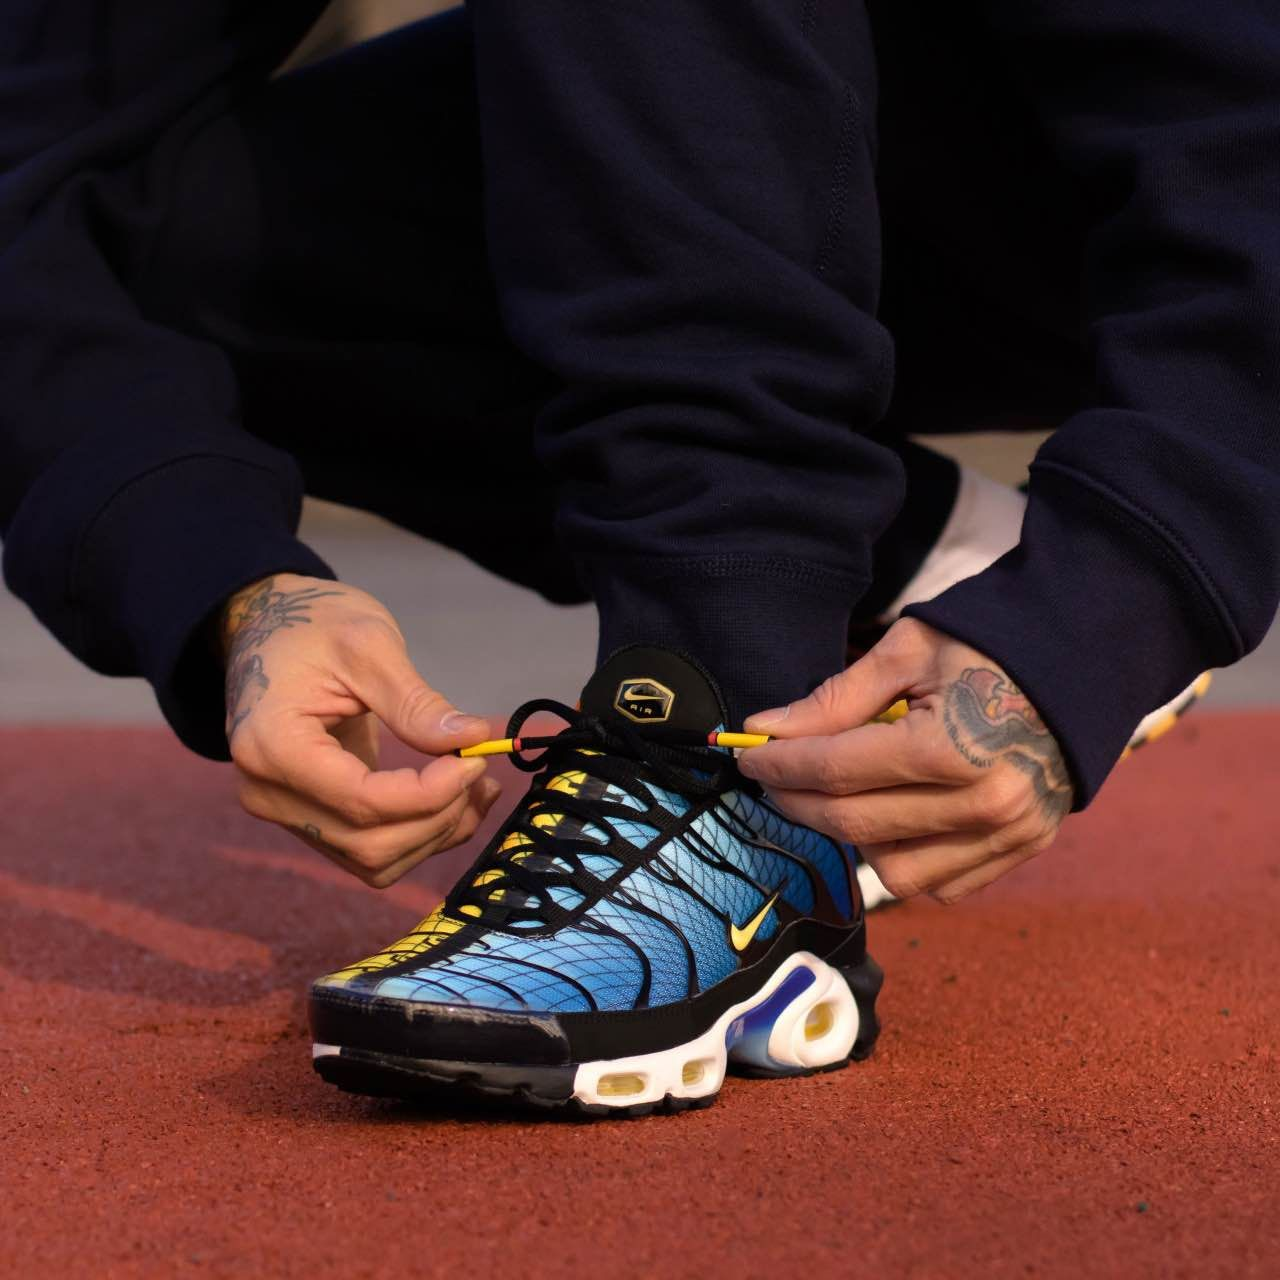 Nike Air Max Plus TN SE   CI7701 001